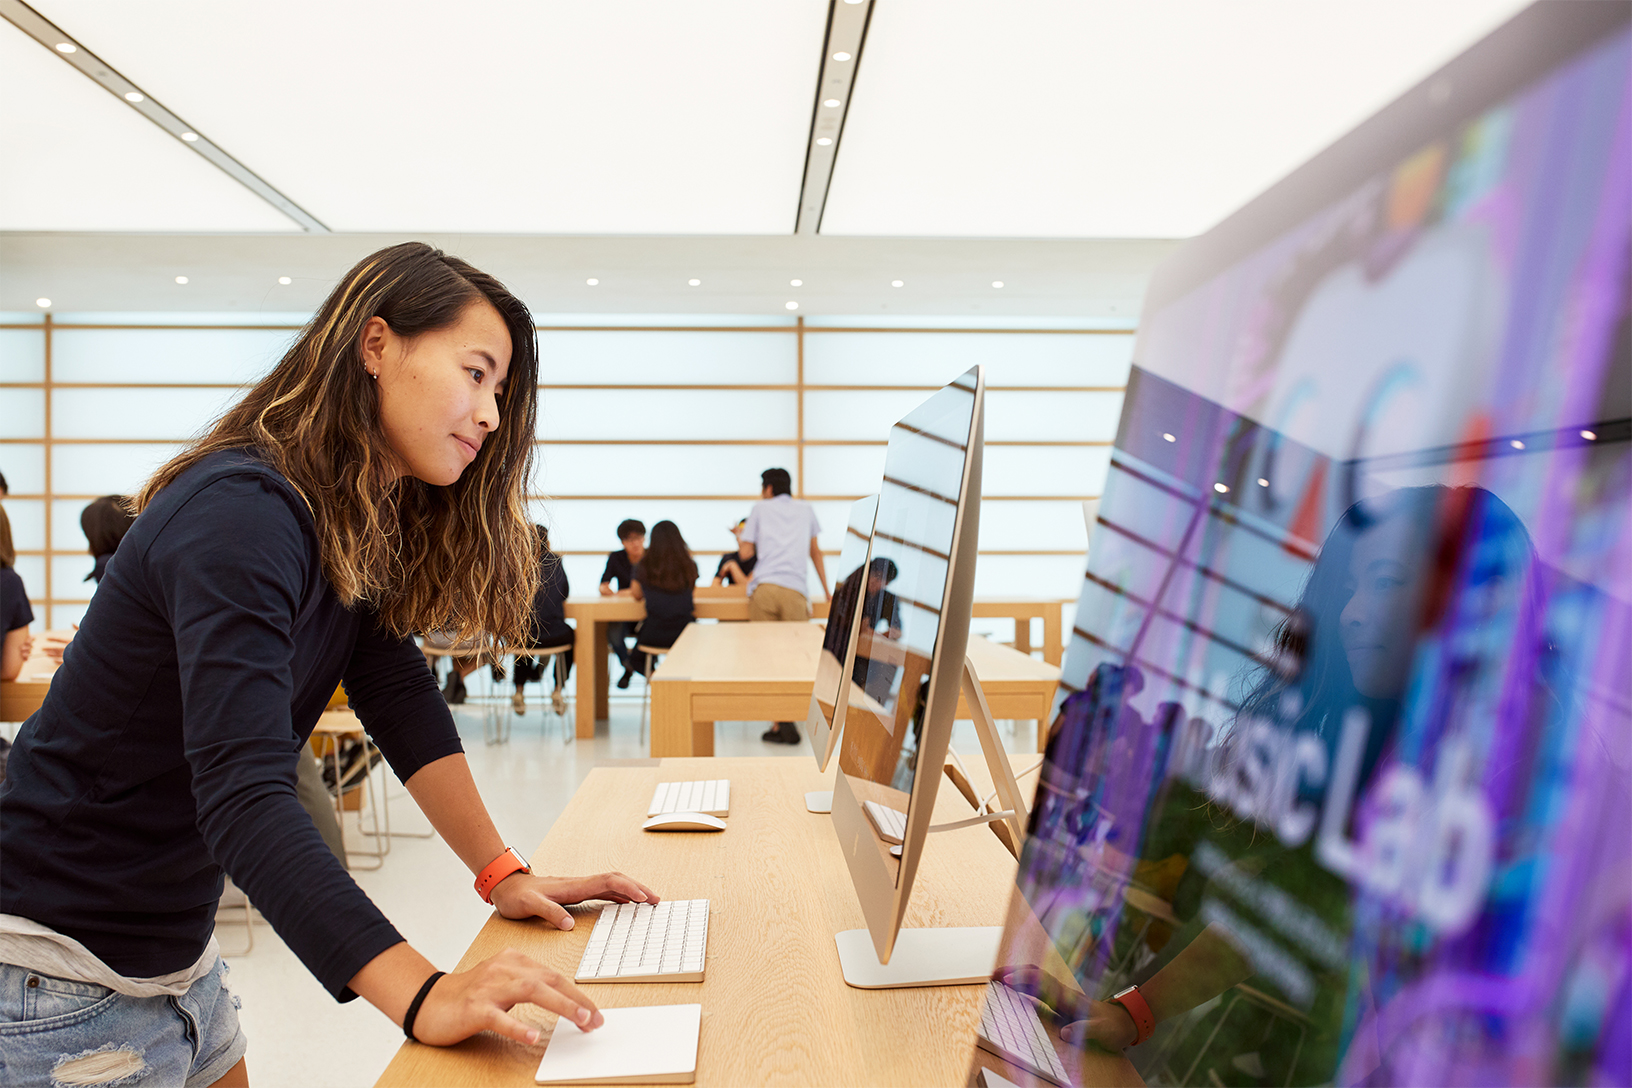 Apple's Kyoto, Japan Store Opens Saturday on Shijō Dori